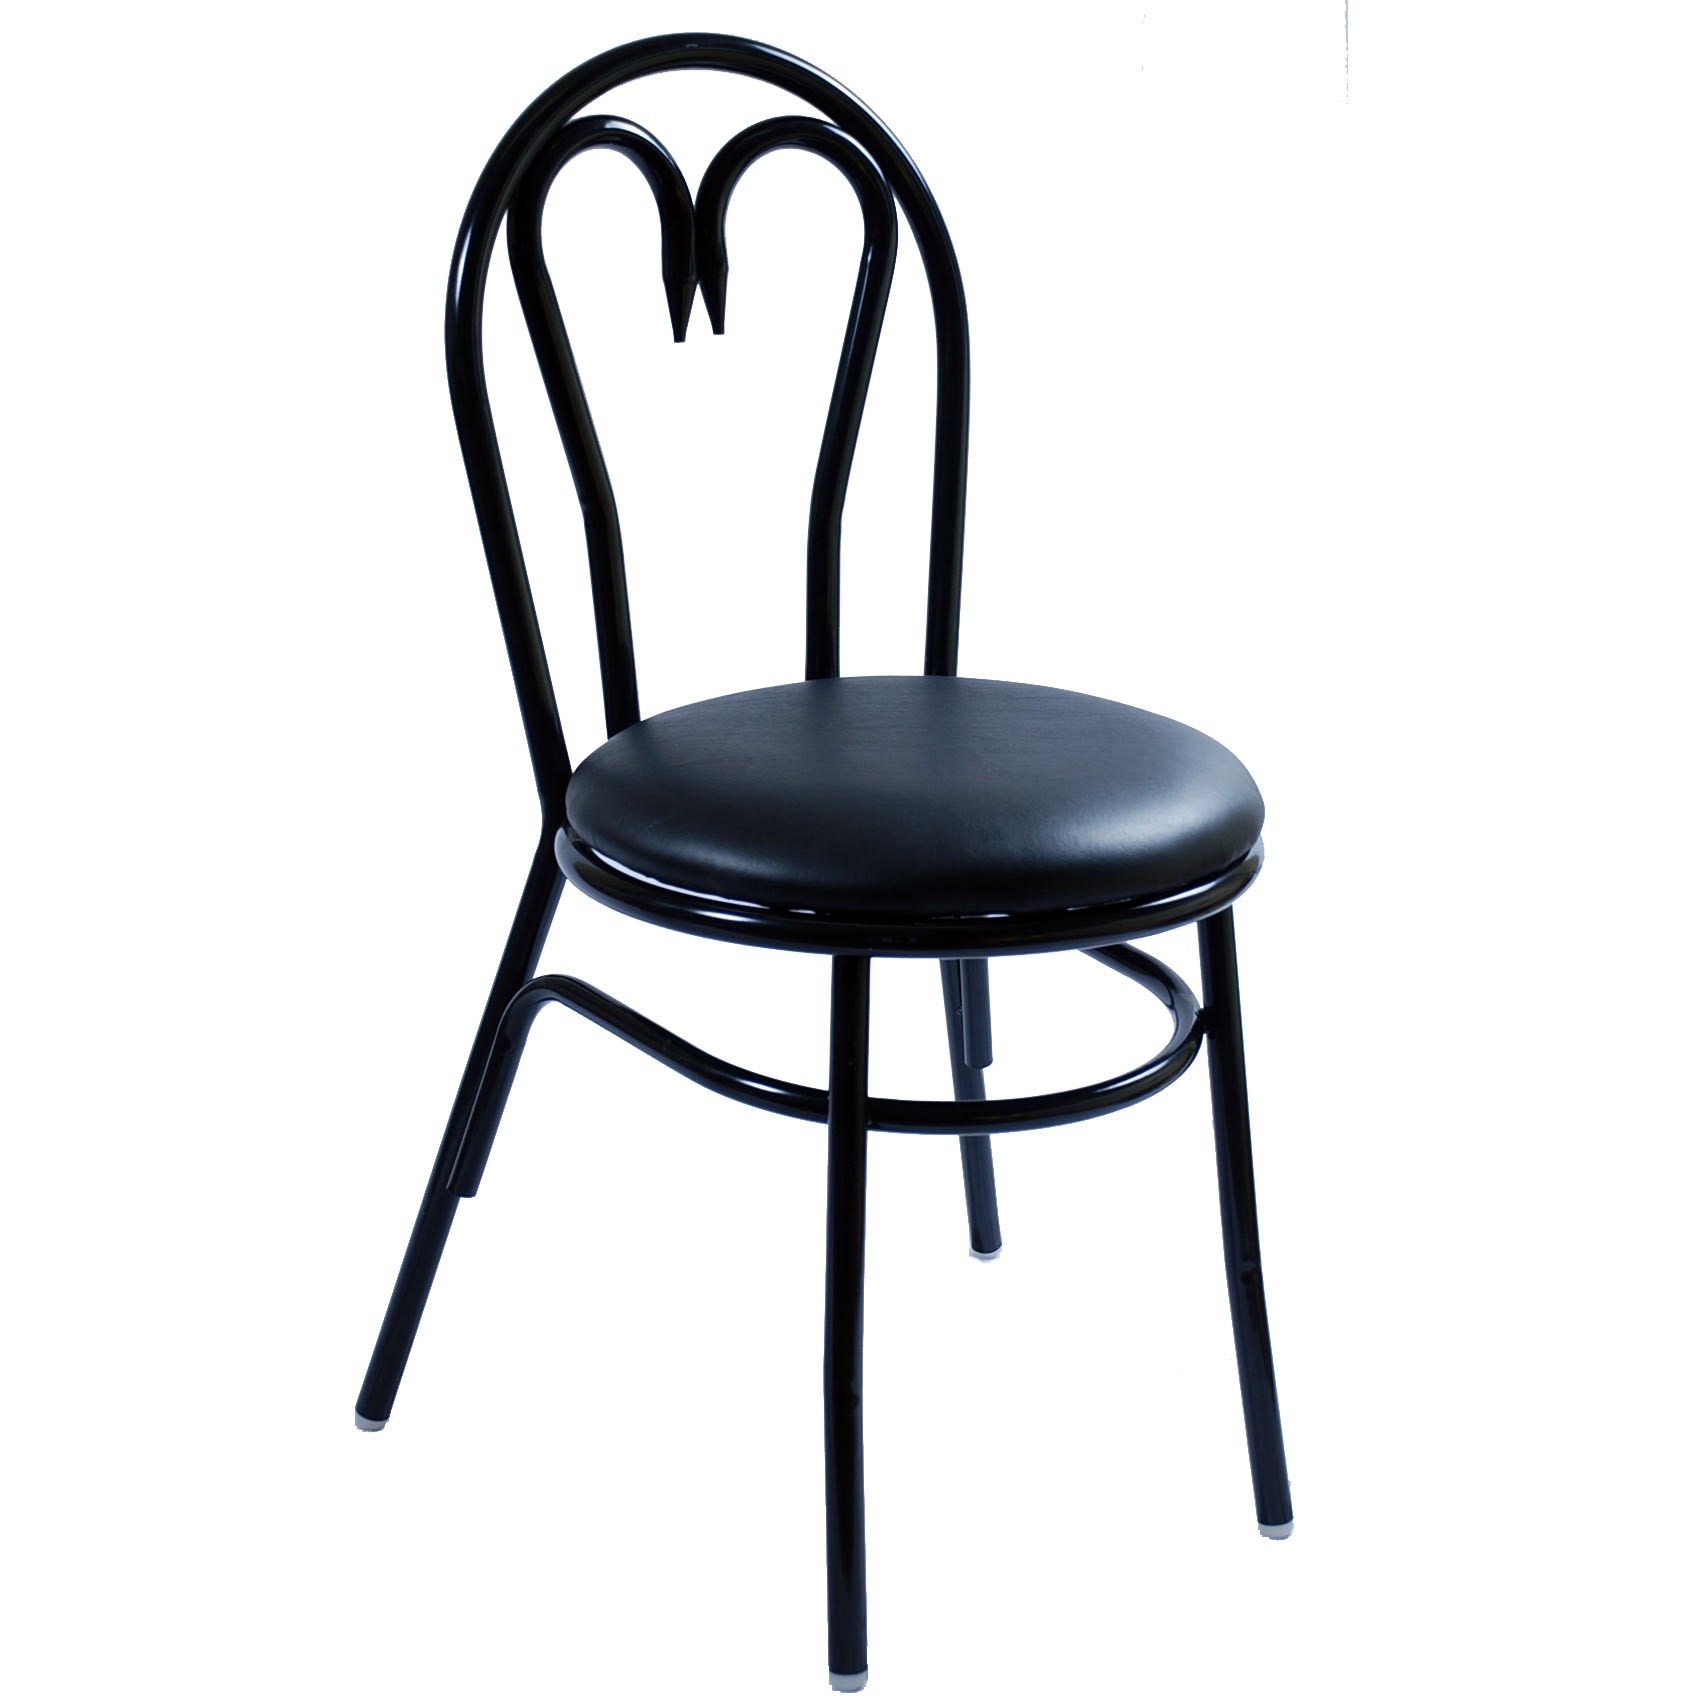 Heart Shaped Metal Chair